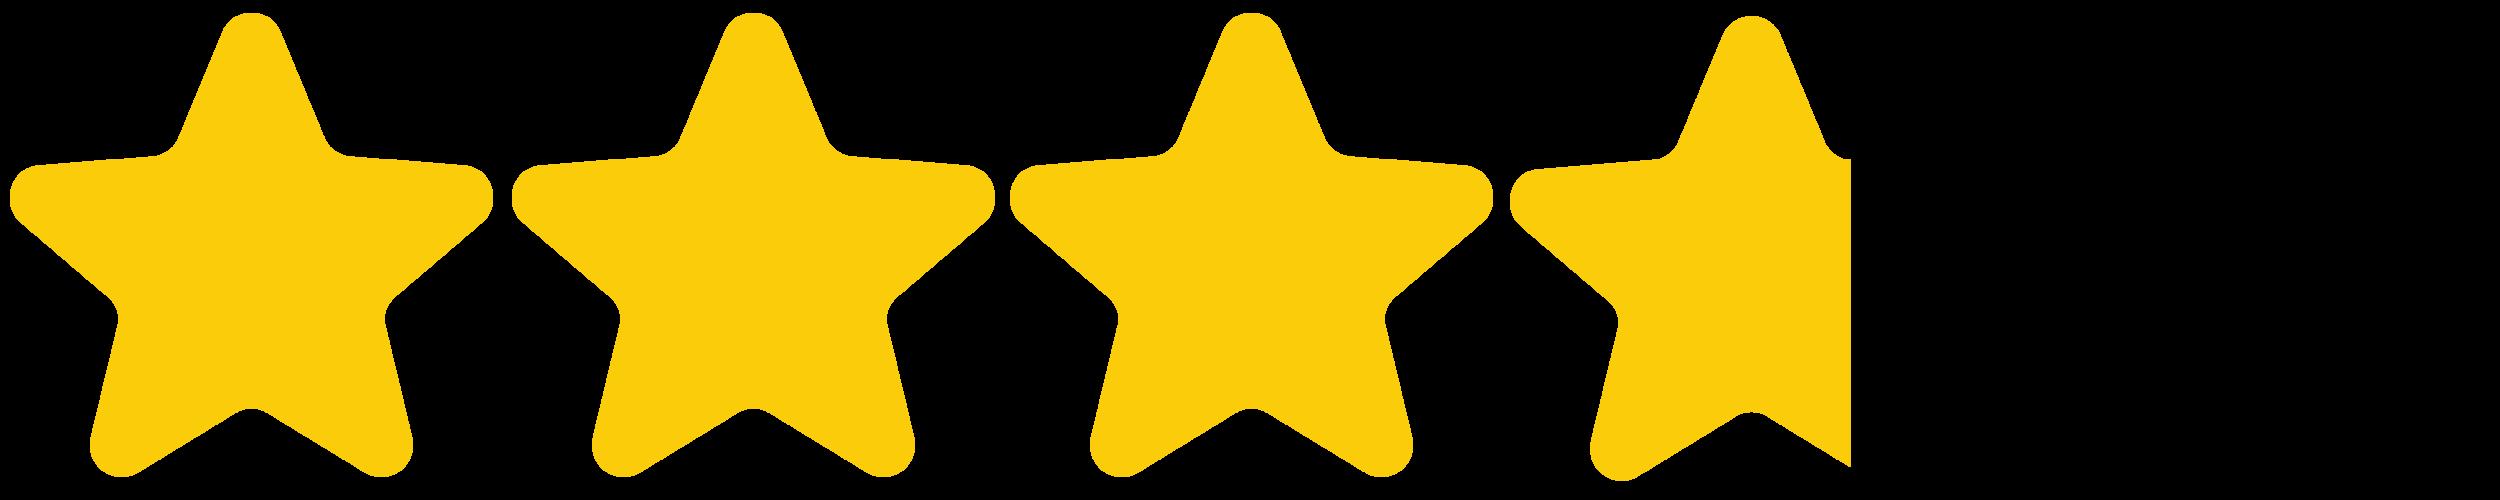 - (3.75 stars)